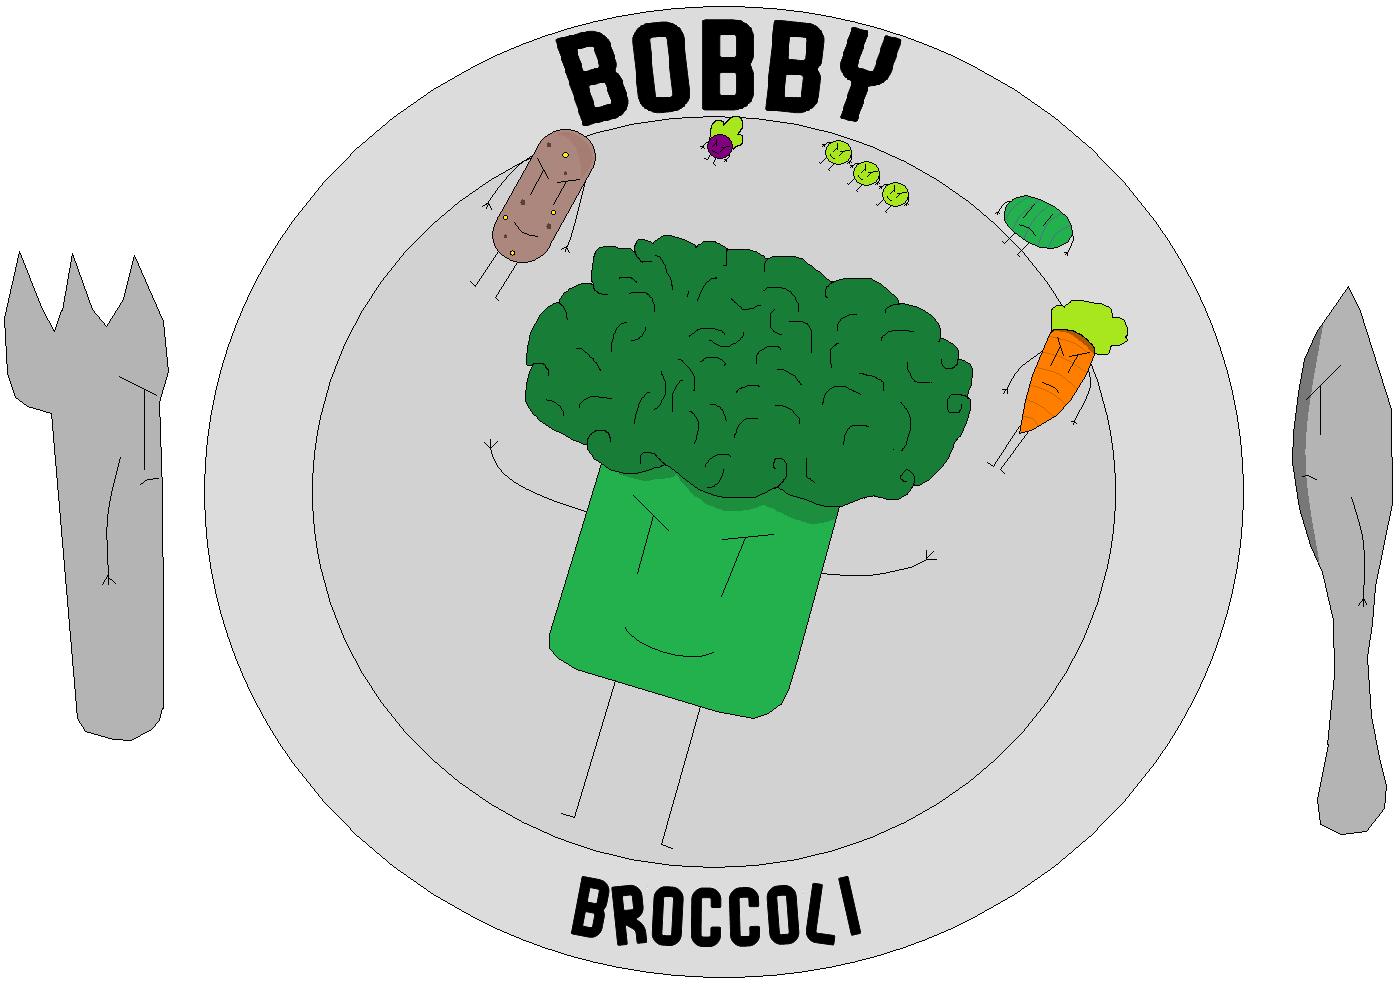 Bobby Broccoli